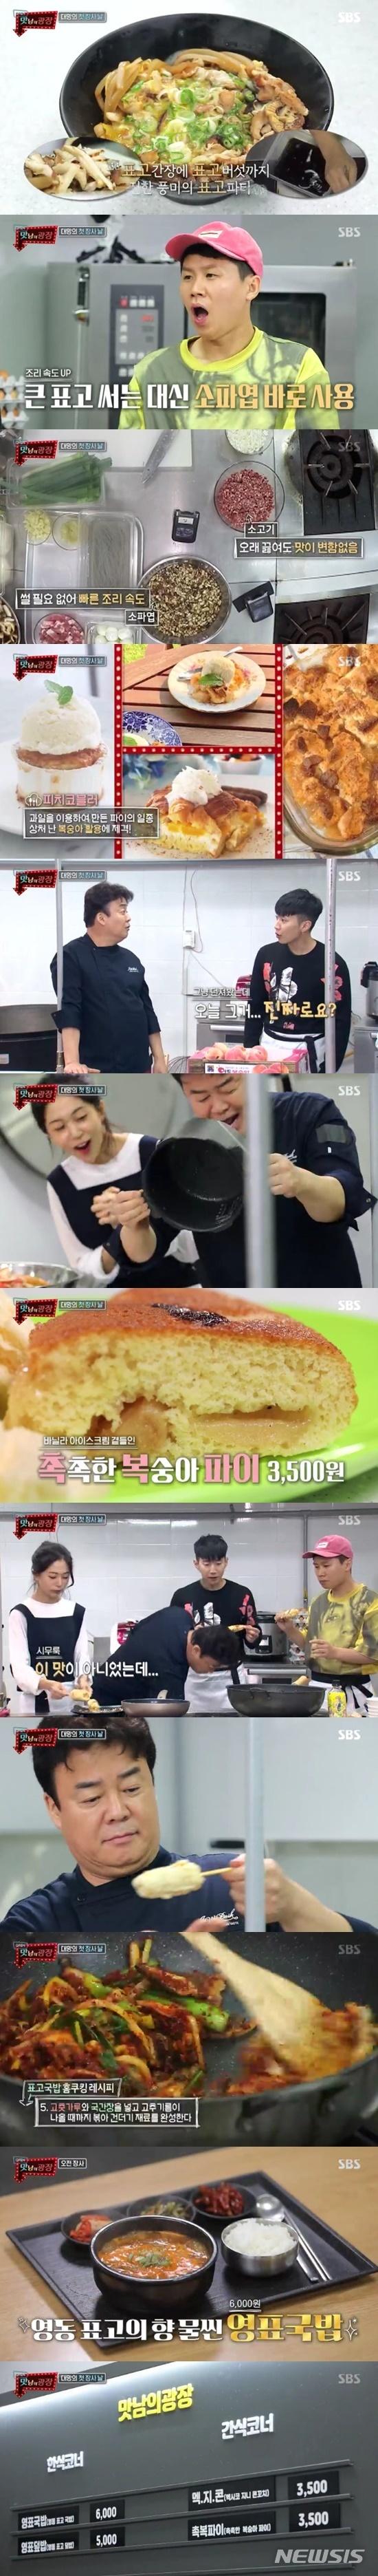 SBS TV 예능 프로그램 '맛남의 광장'